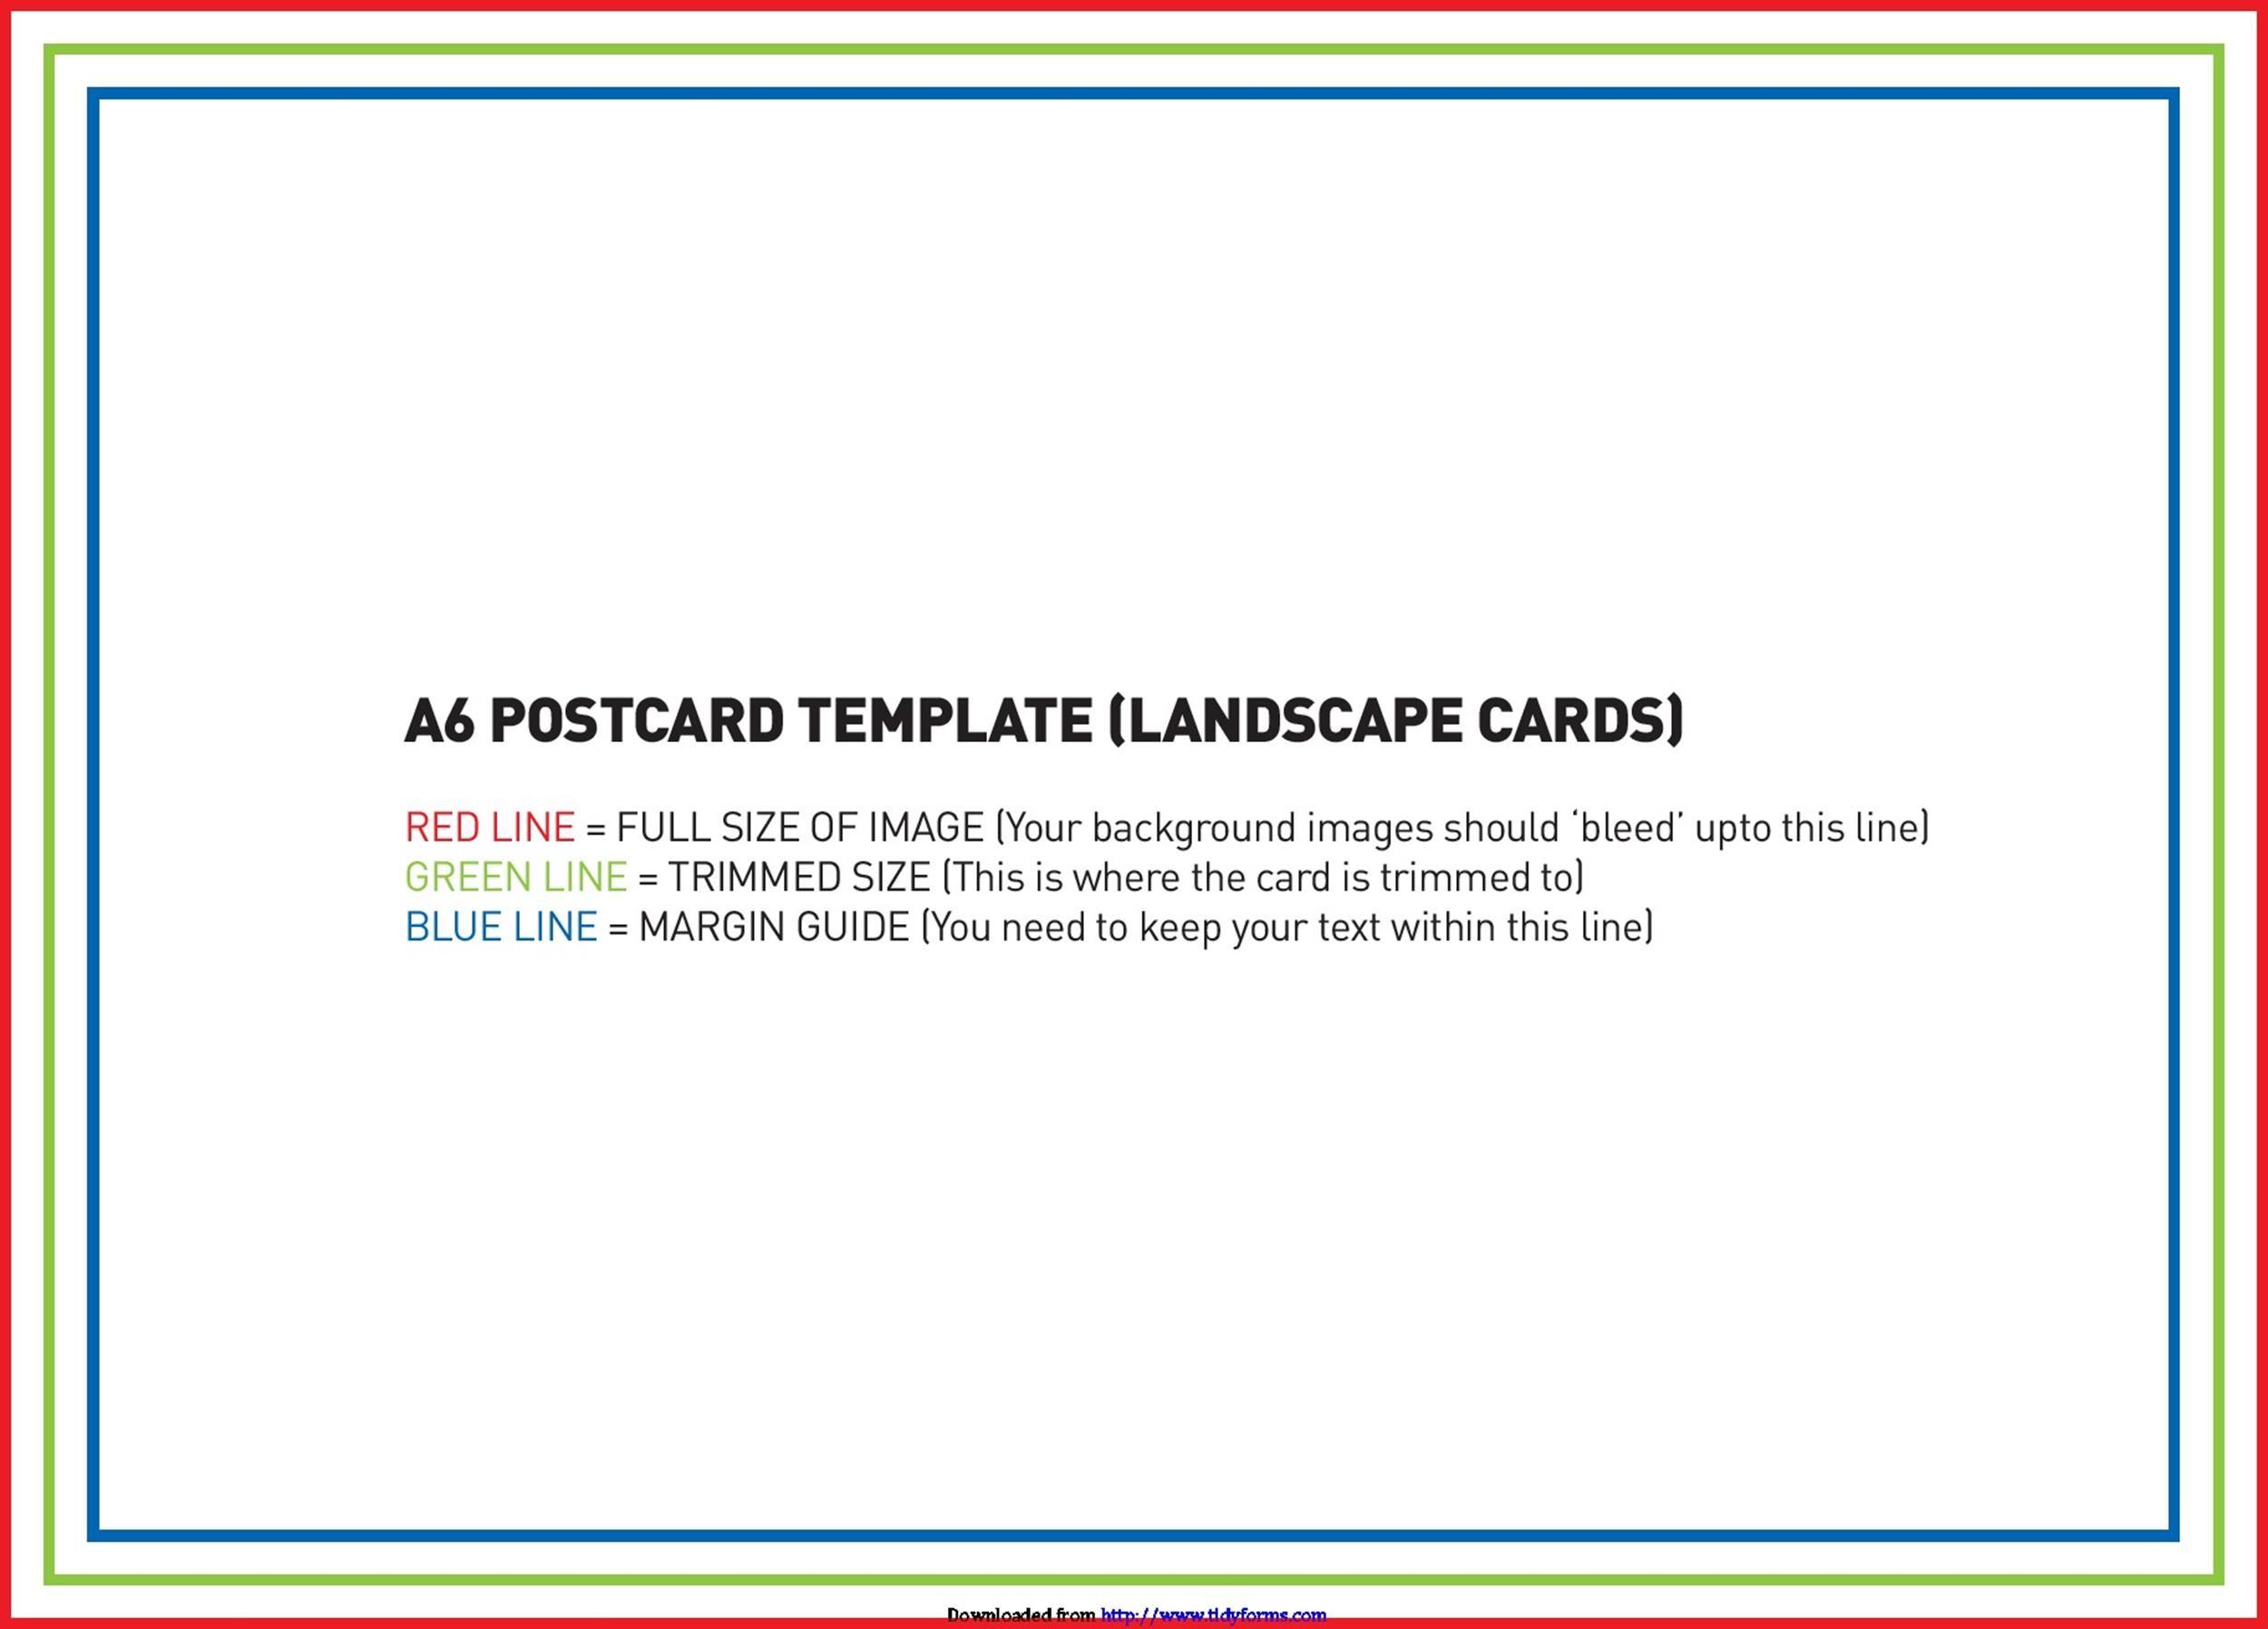 40+ Great Postcard Templates  Designs Word + PDF ᐅ Template Lab